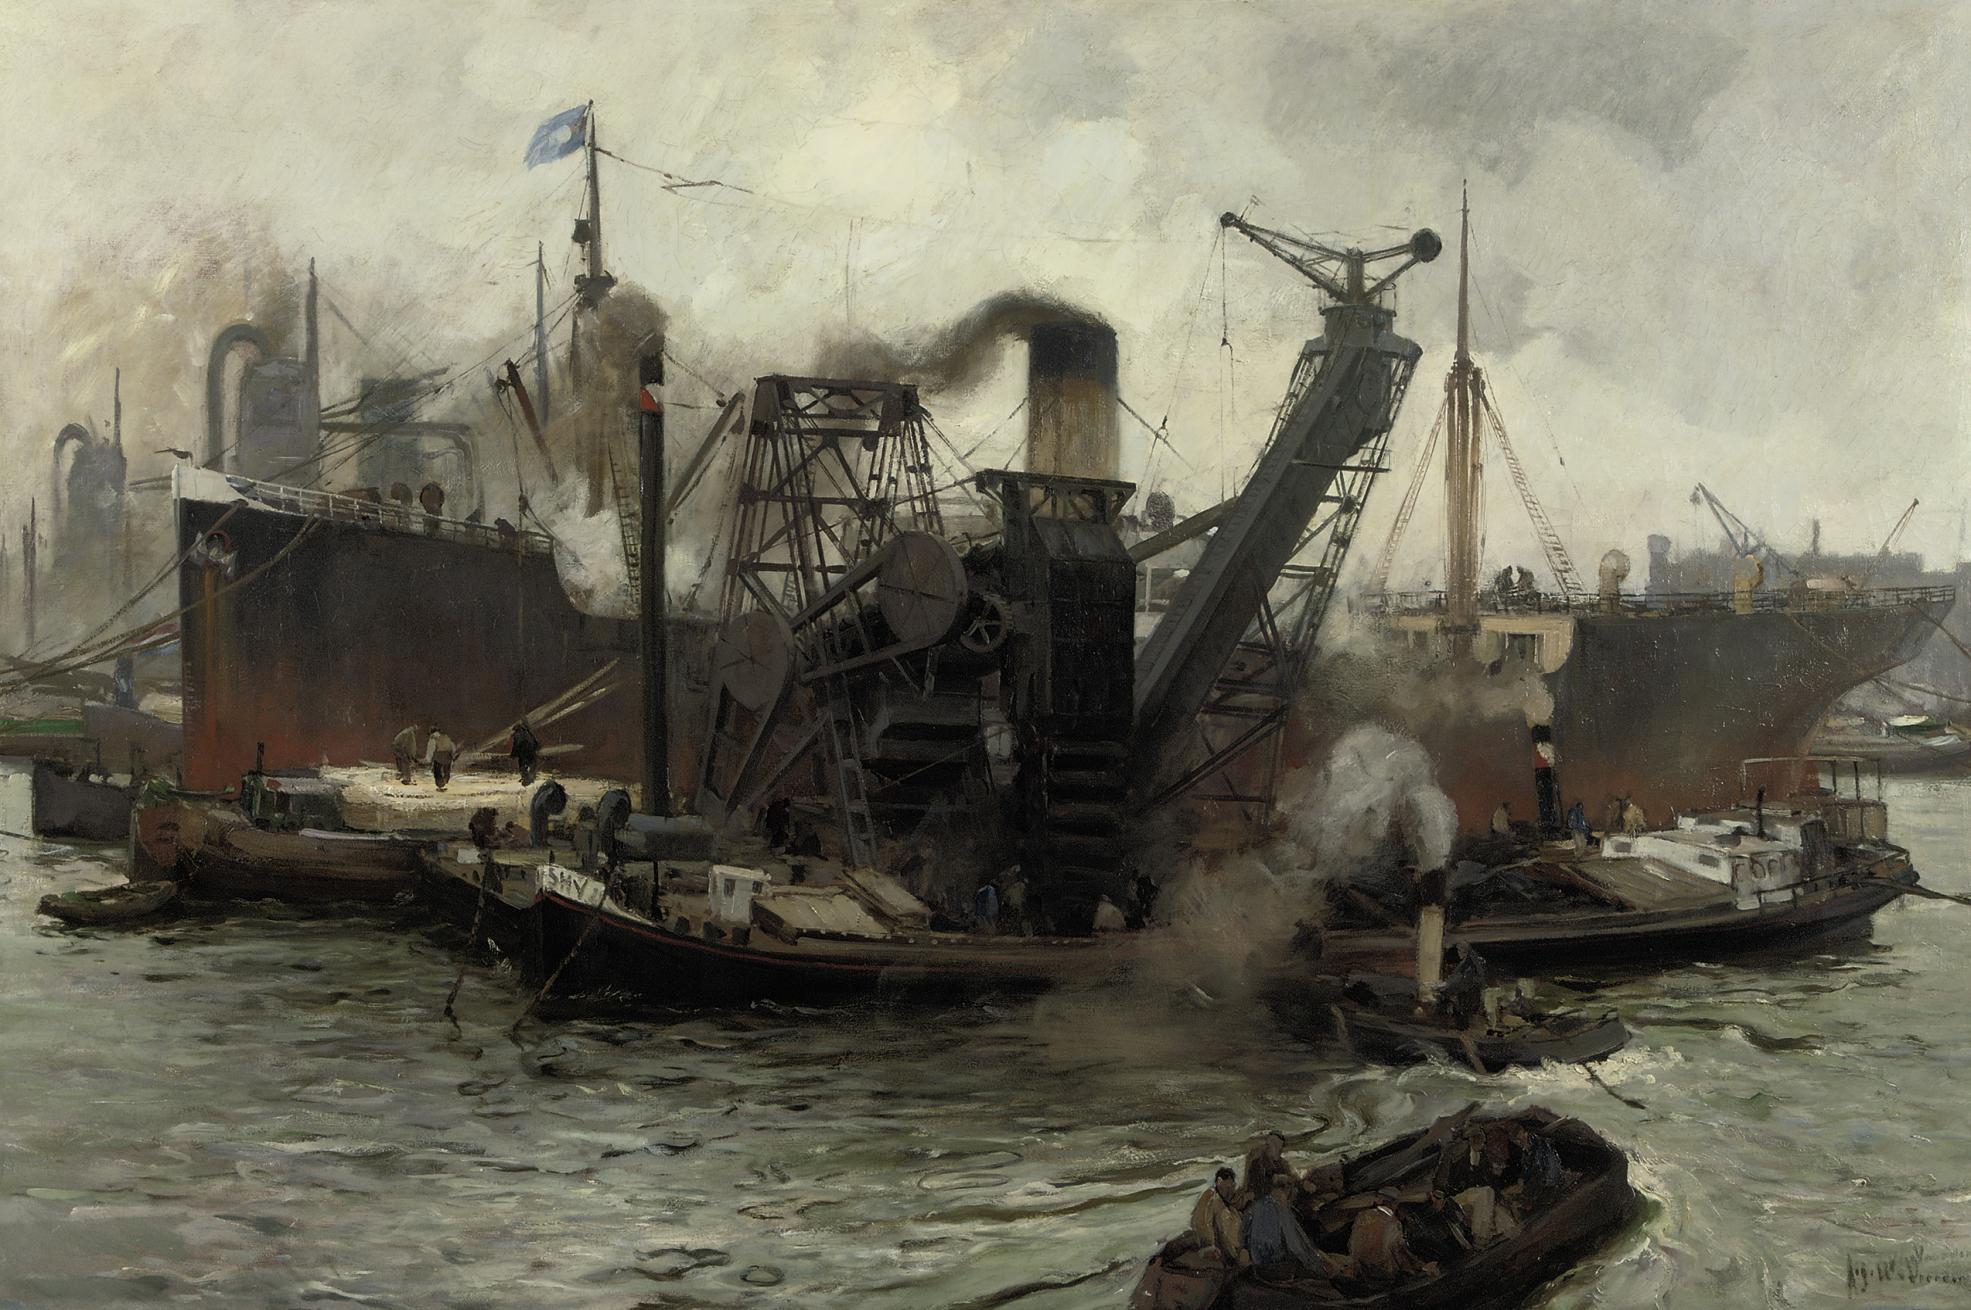 Steenkolen transport: Transportation of Coals